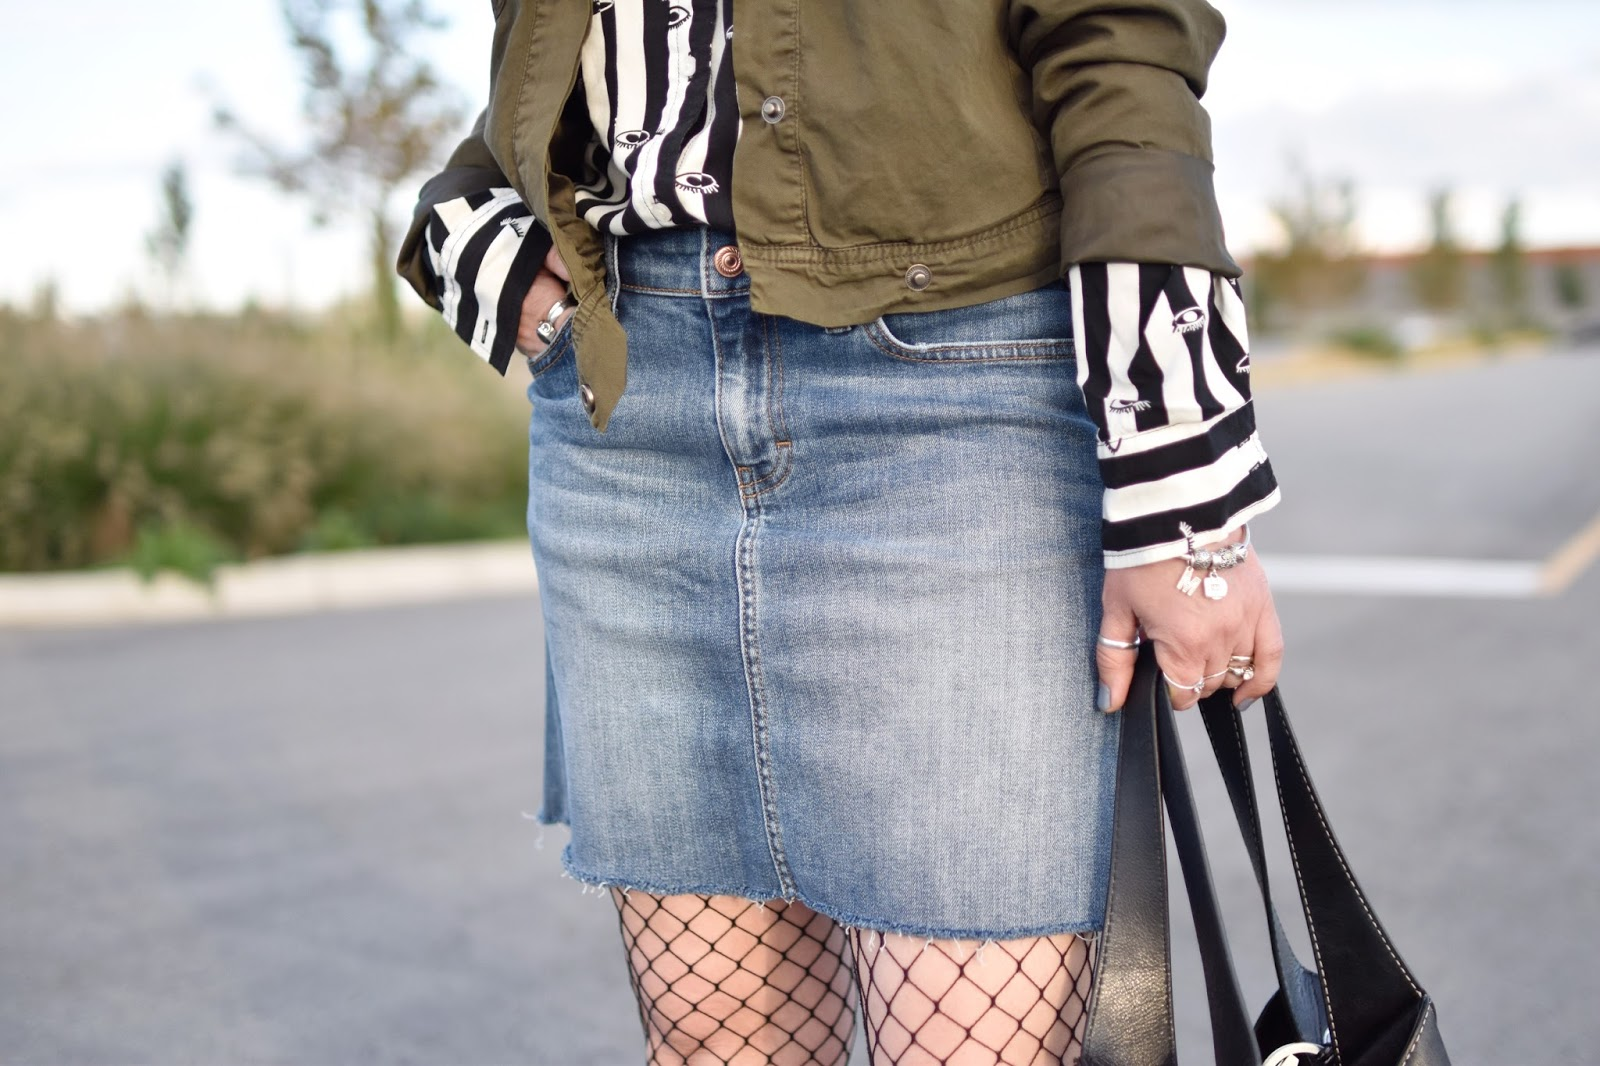 Monika Faulkner outfit inspiration - denim mini skirt, fishnet tights, black-and-white patterned shirt, olive cargo jacket